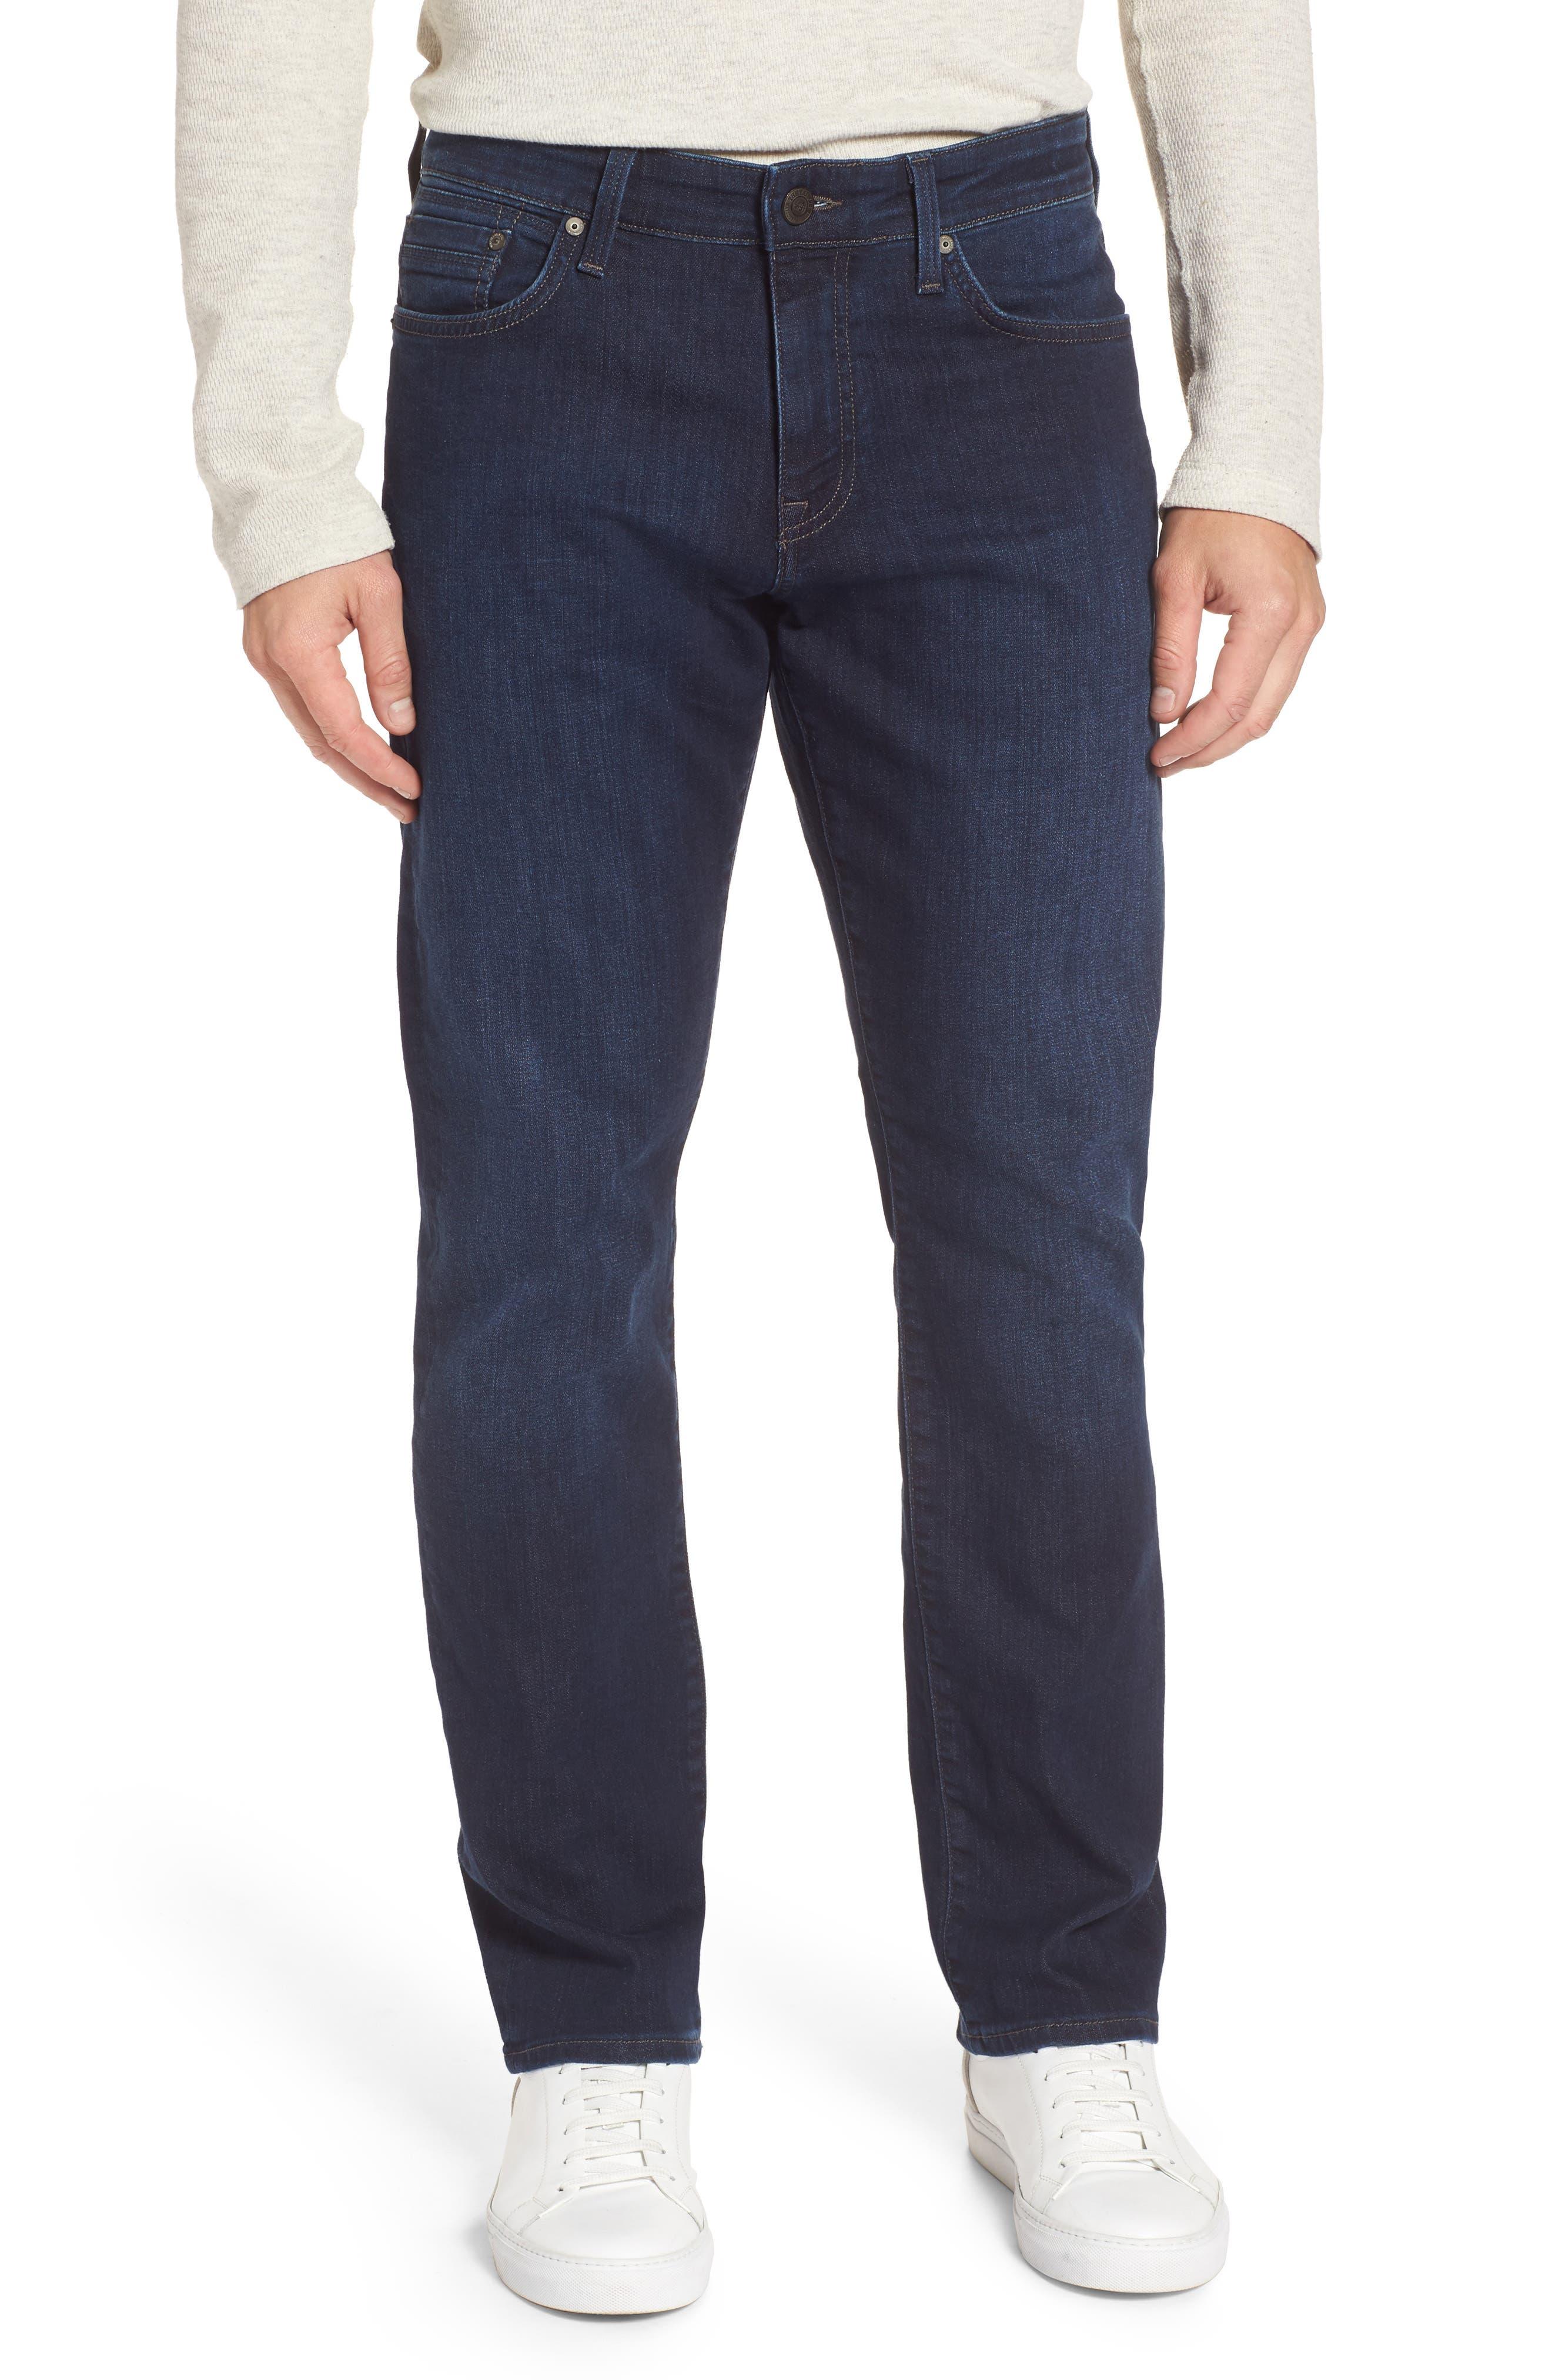 Main Image - Mavi Jeans Myles Straight Fit Jeans (Deep Clean Comfort)